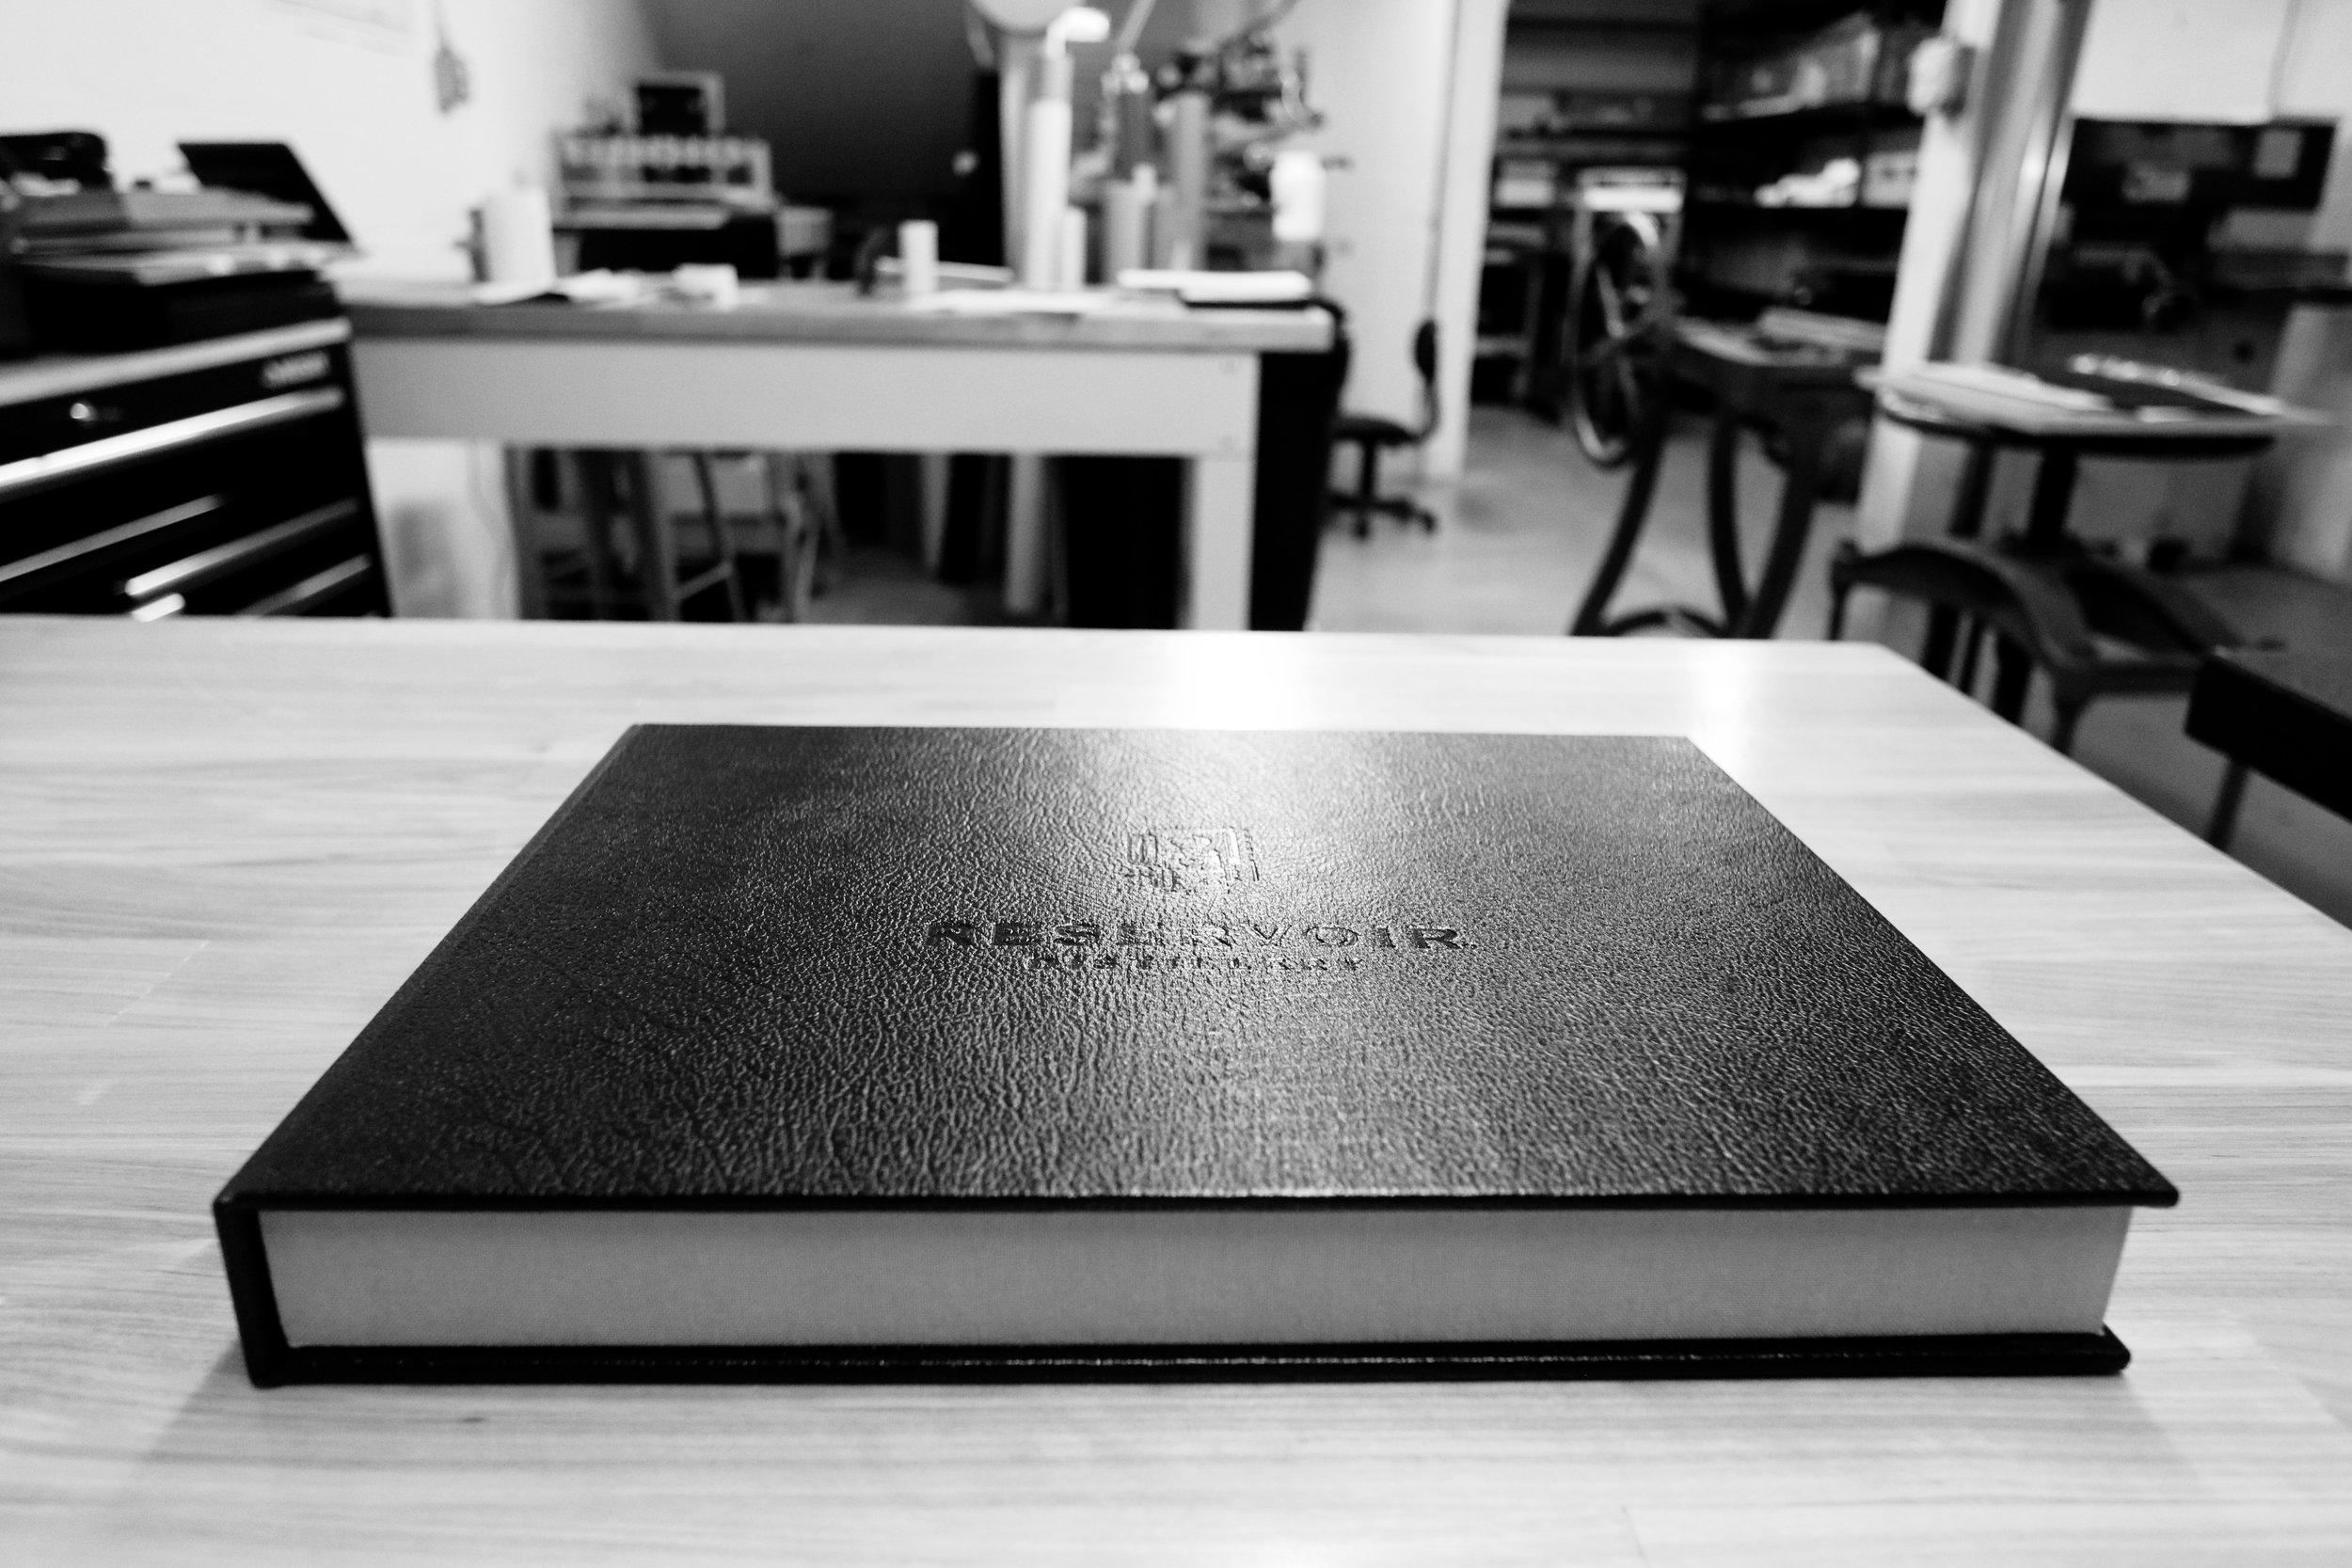 BCRBookbindingbookbox1.JPG